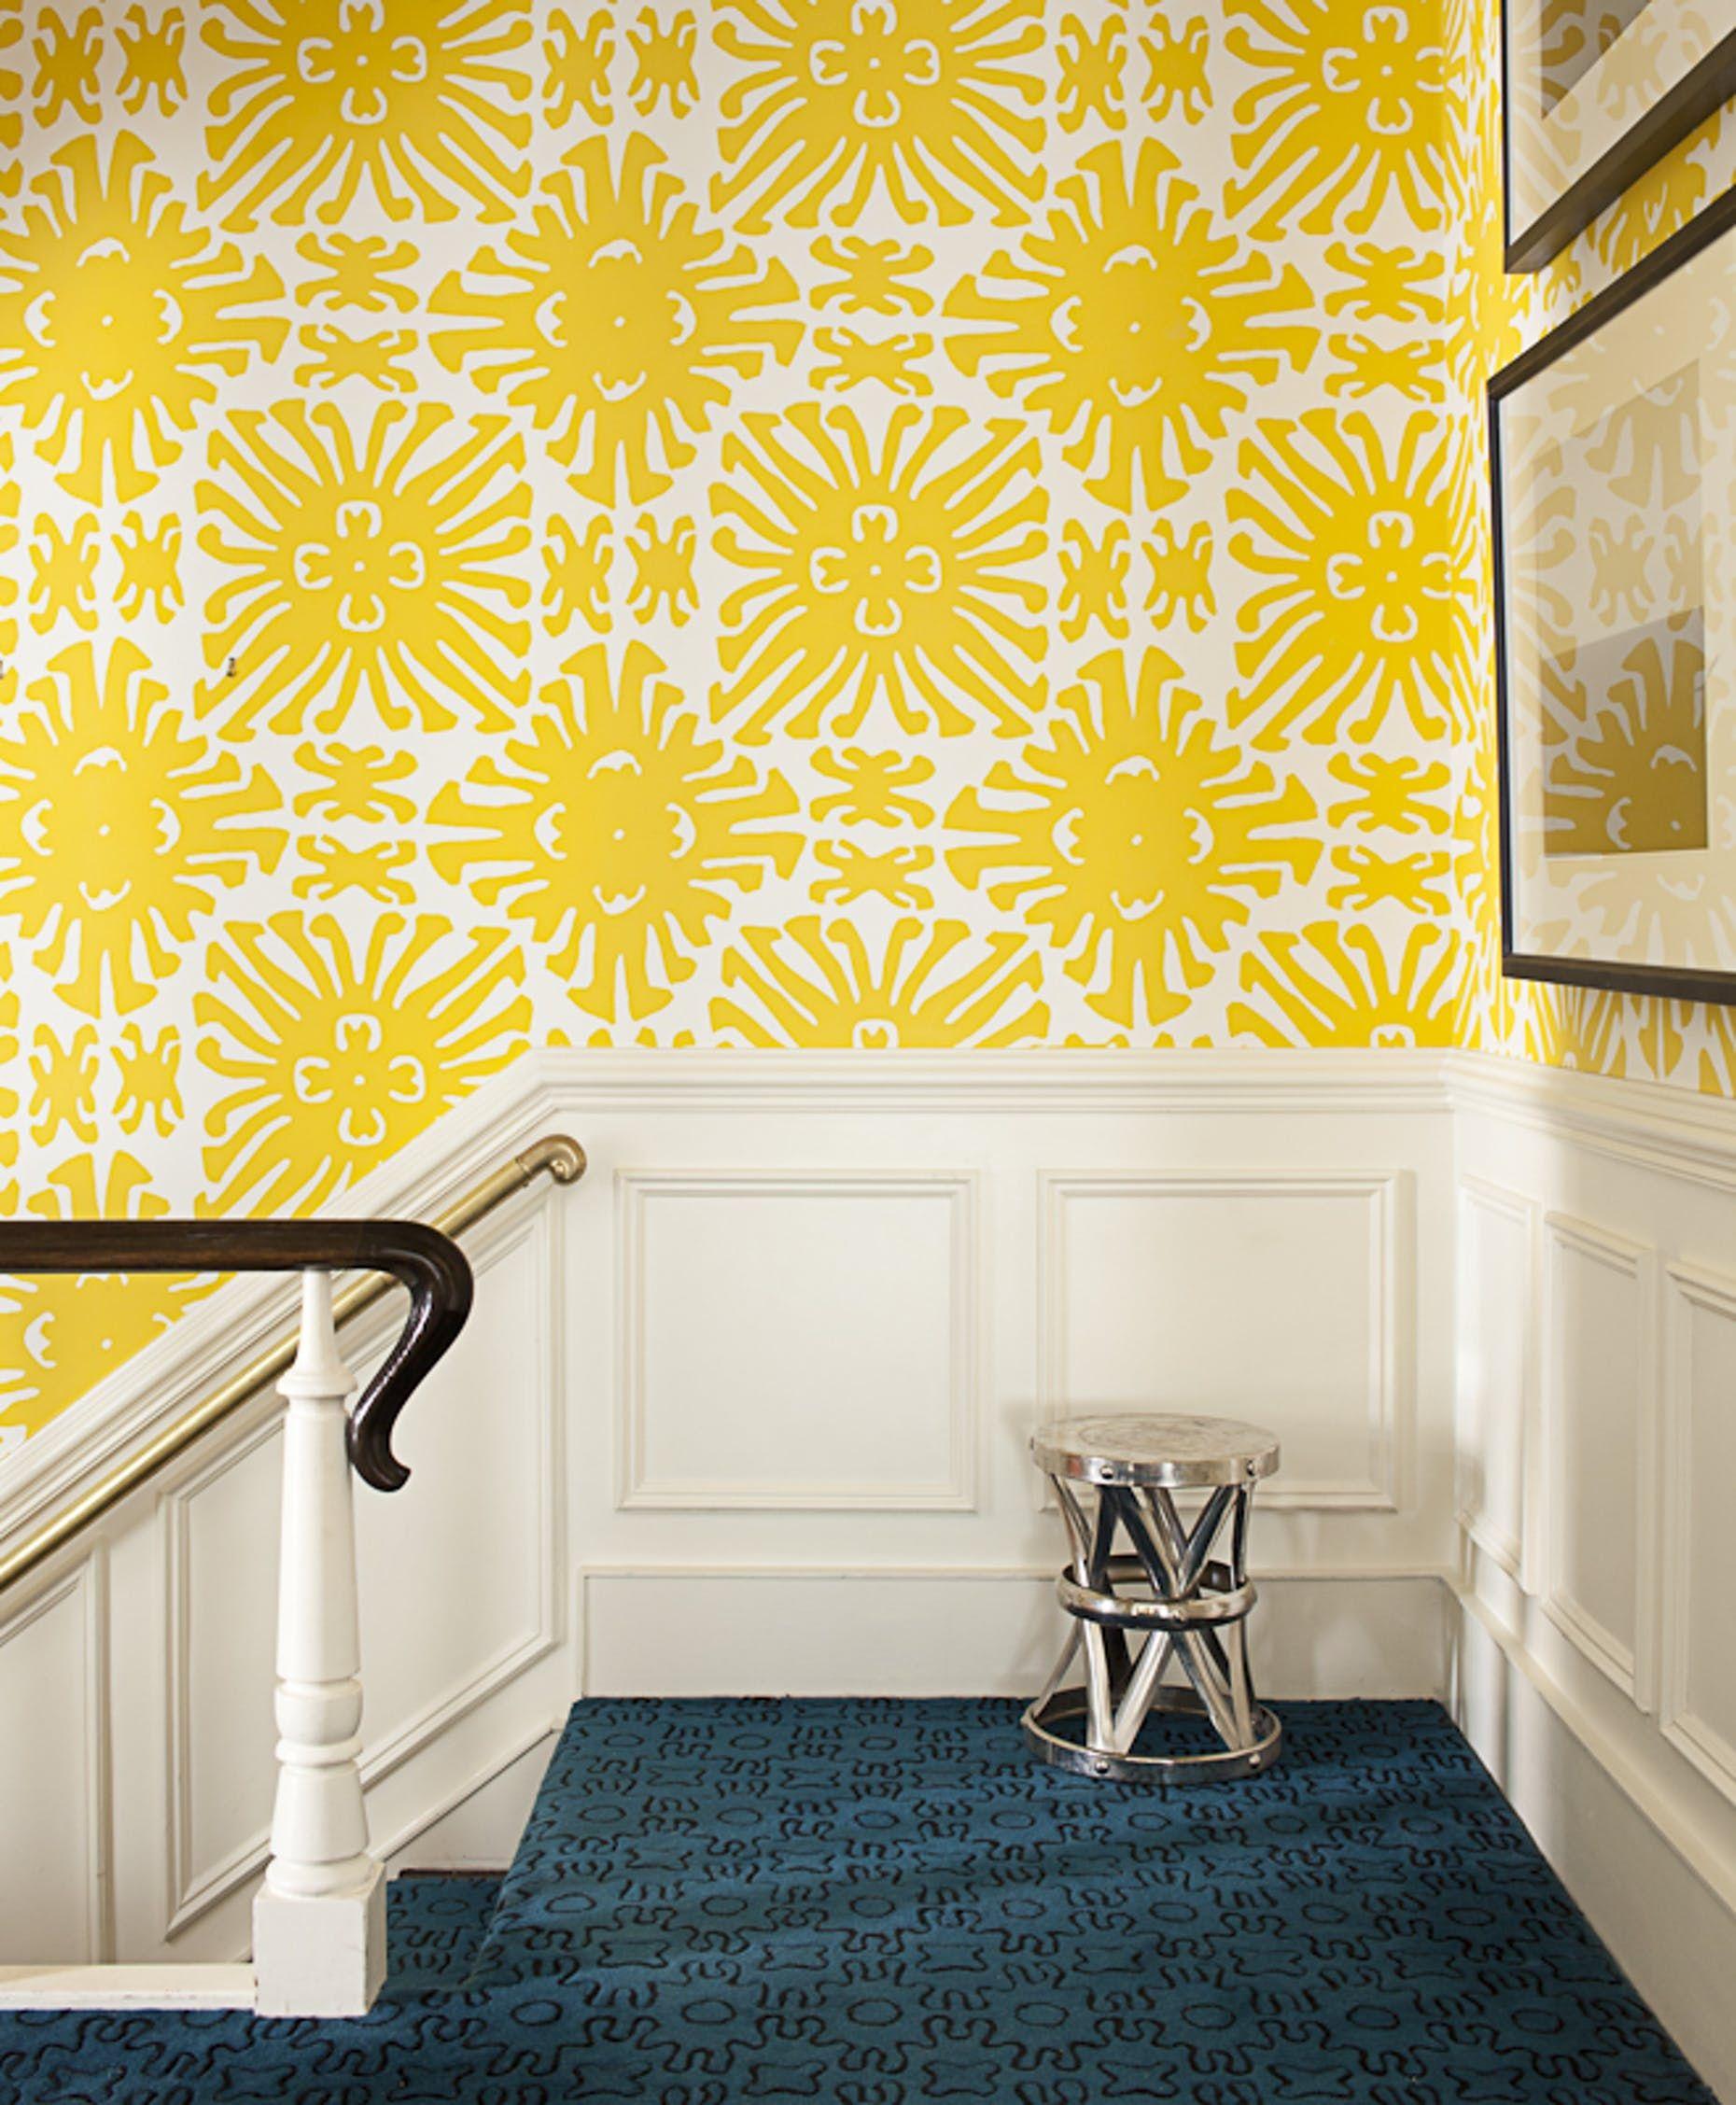 Go Bananas: 18 Ways to Decorate With Yellow | Bananas, Decorating ...